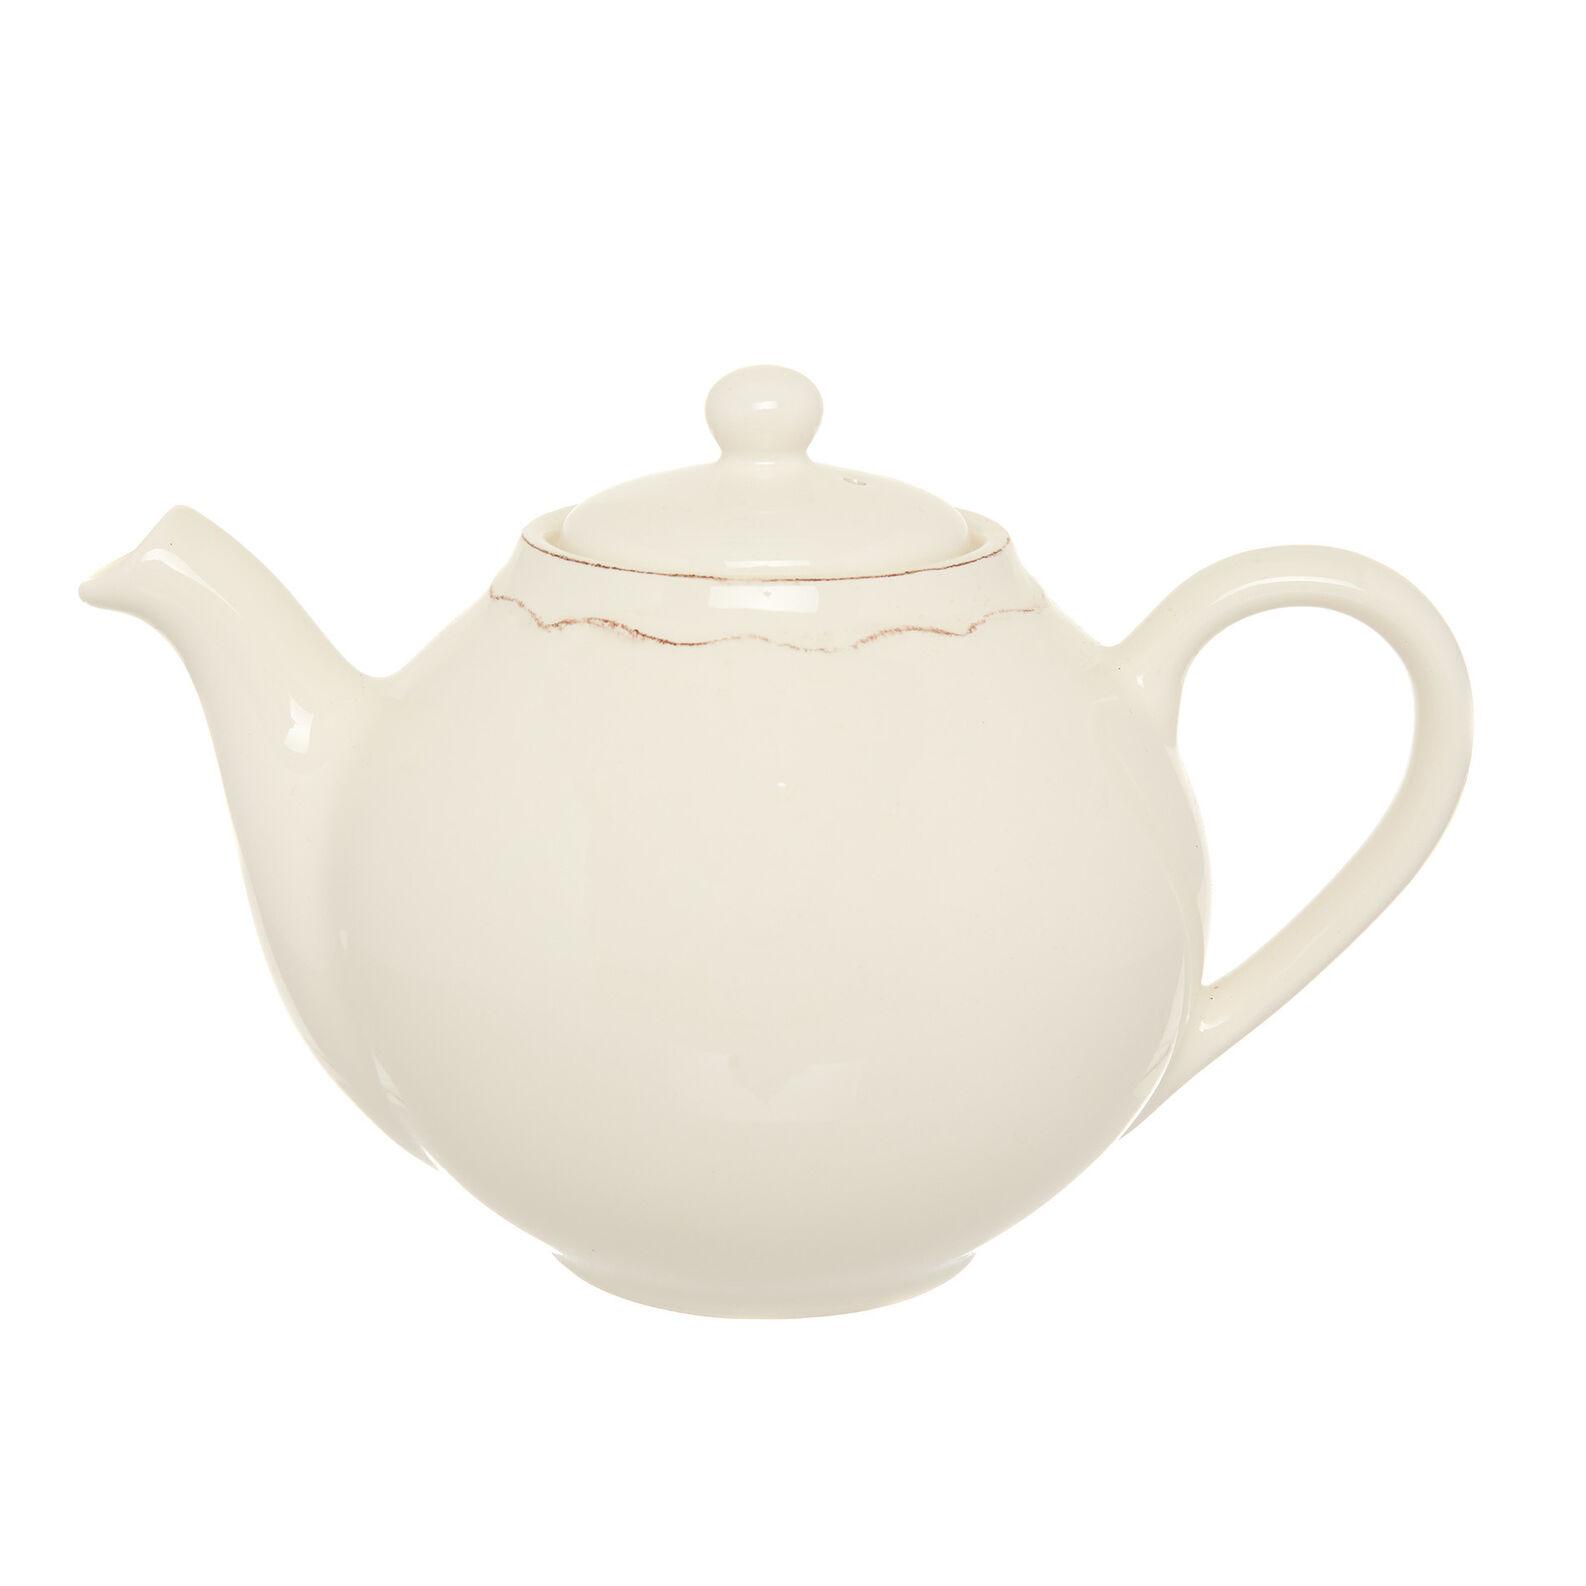 Dona Maria ceramic teapot